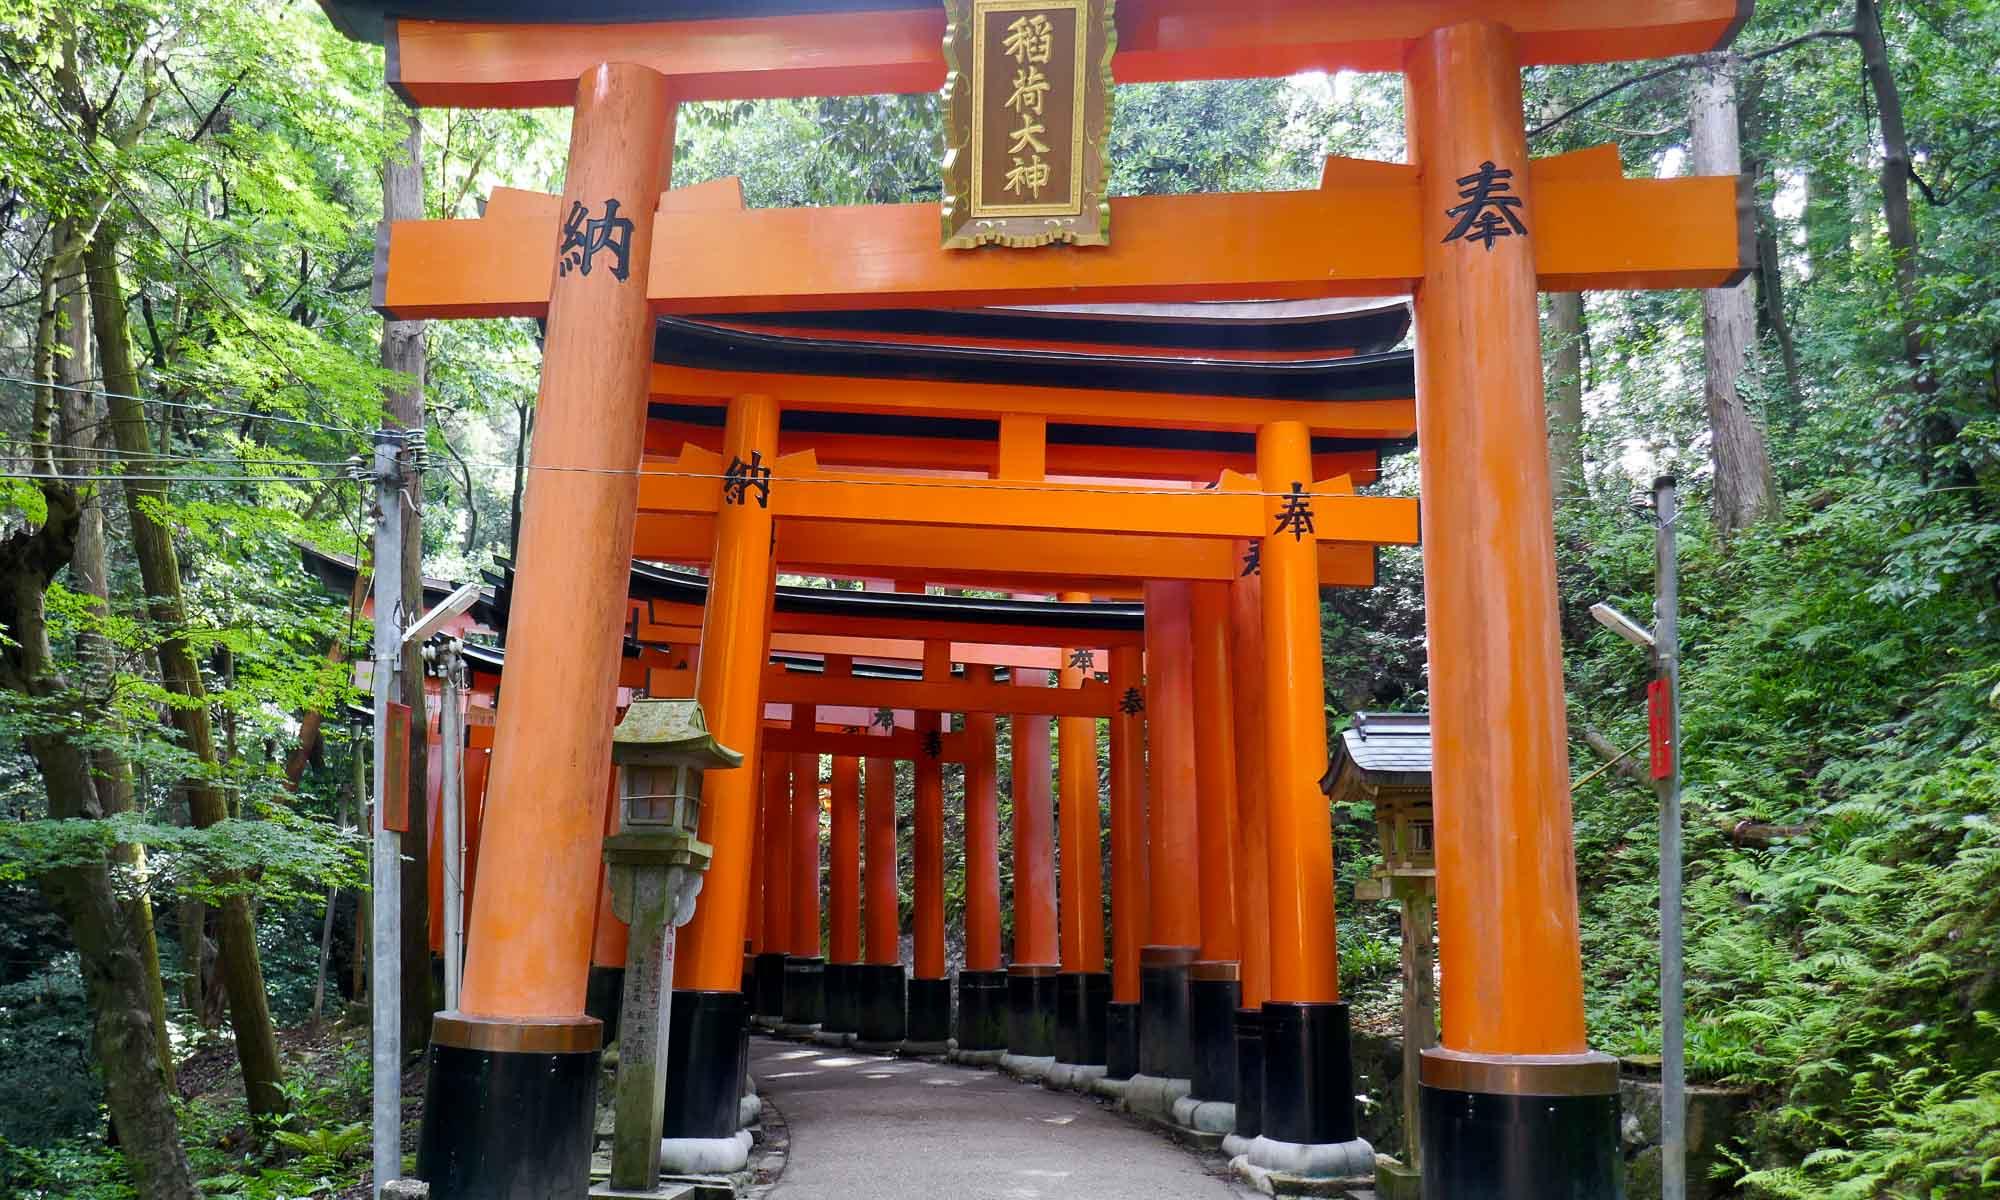 A set of large torii